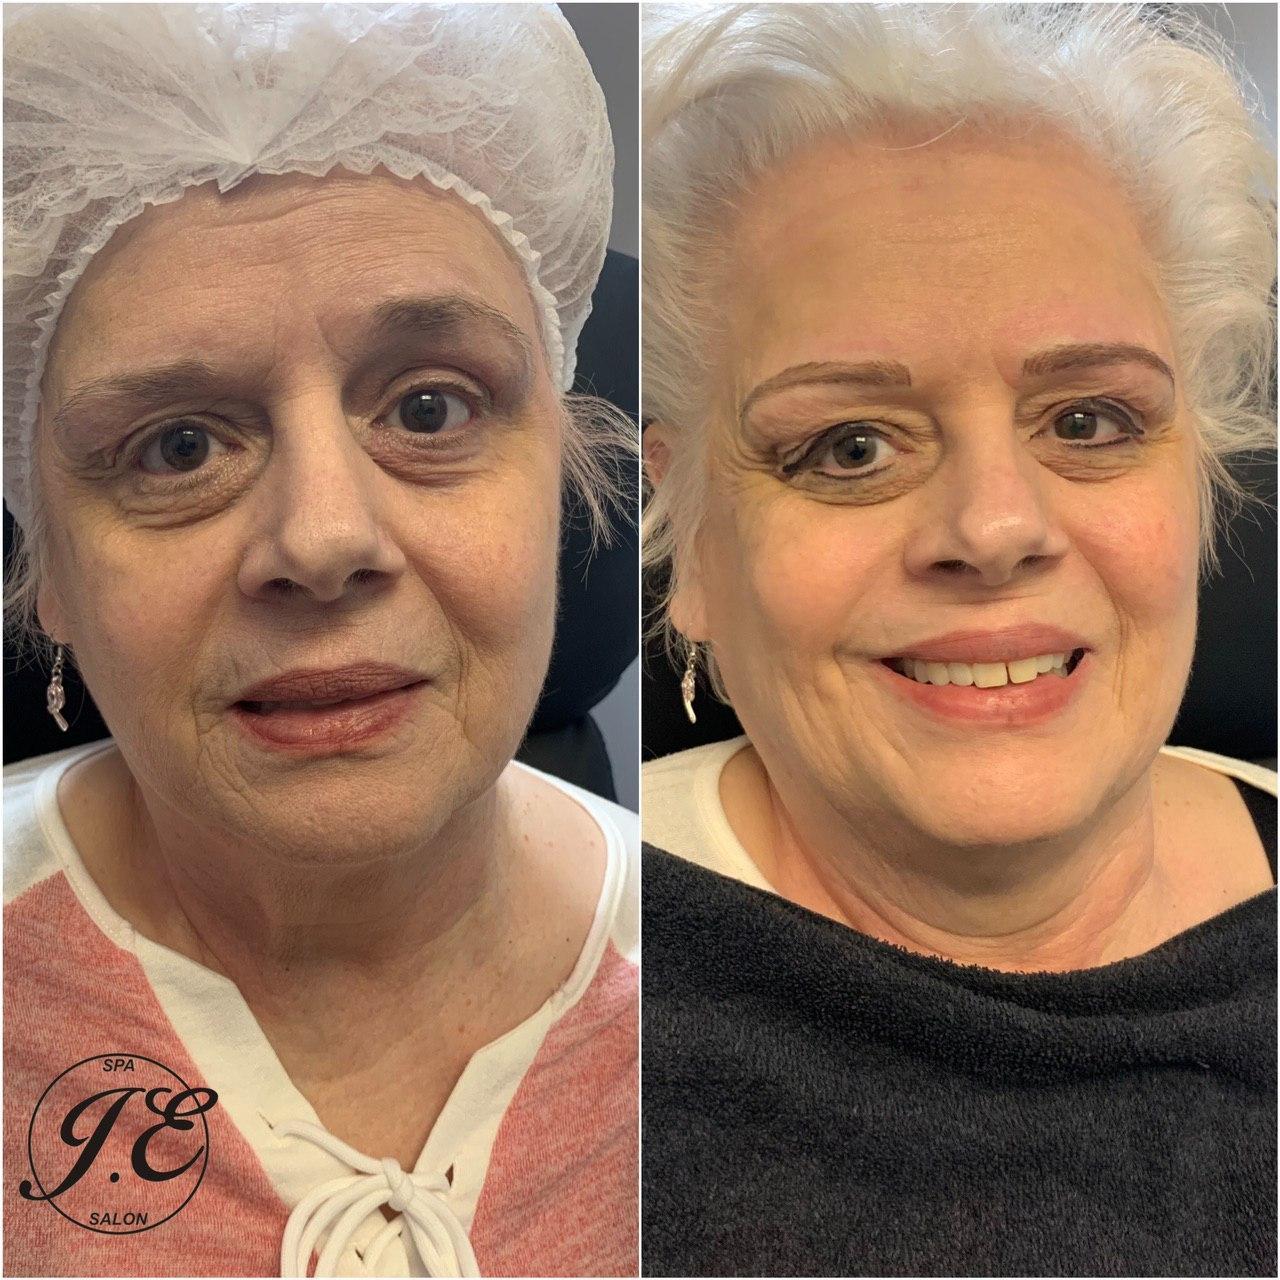 permanent eyeliner jespasalon.jpg